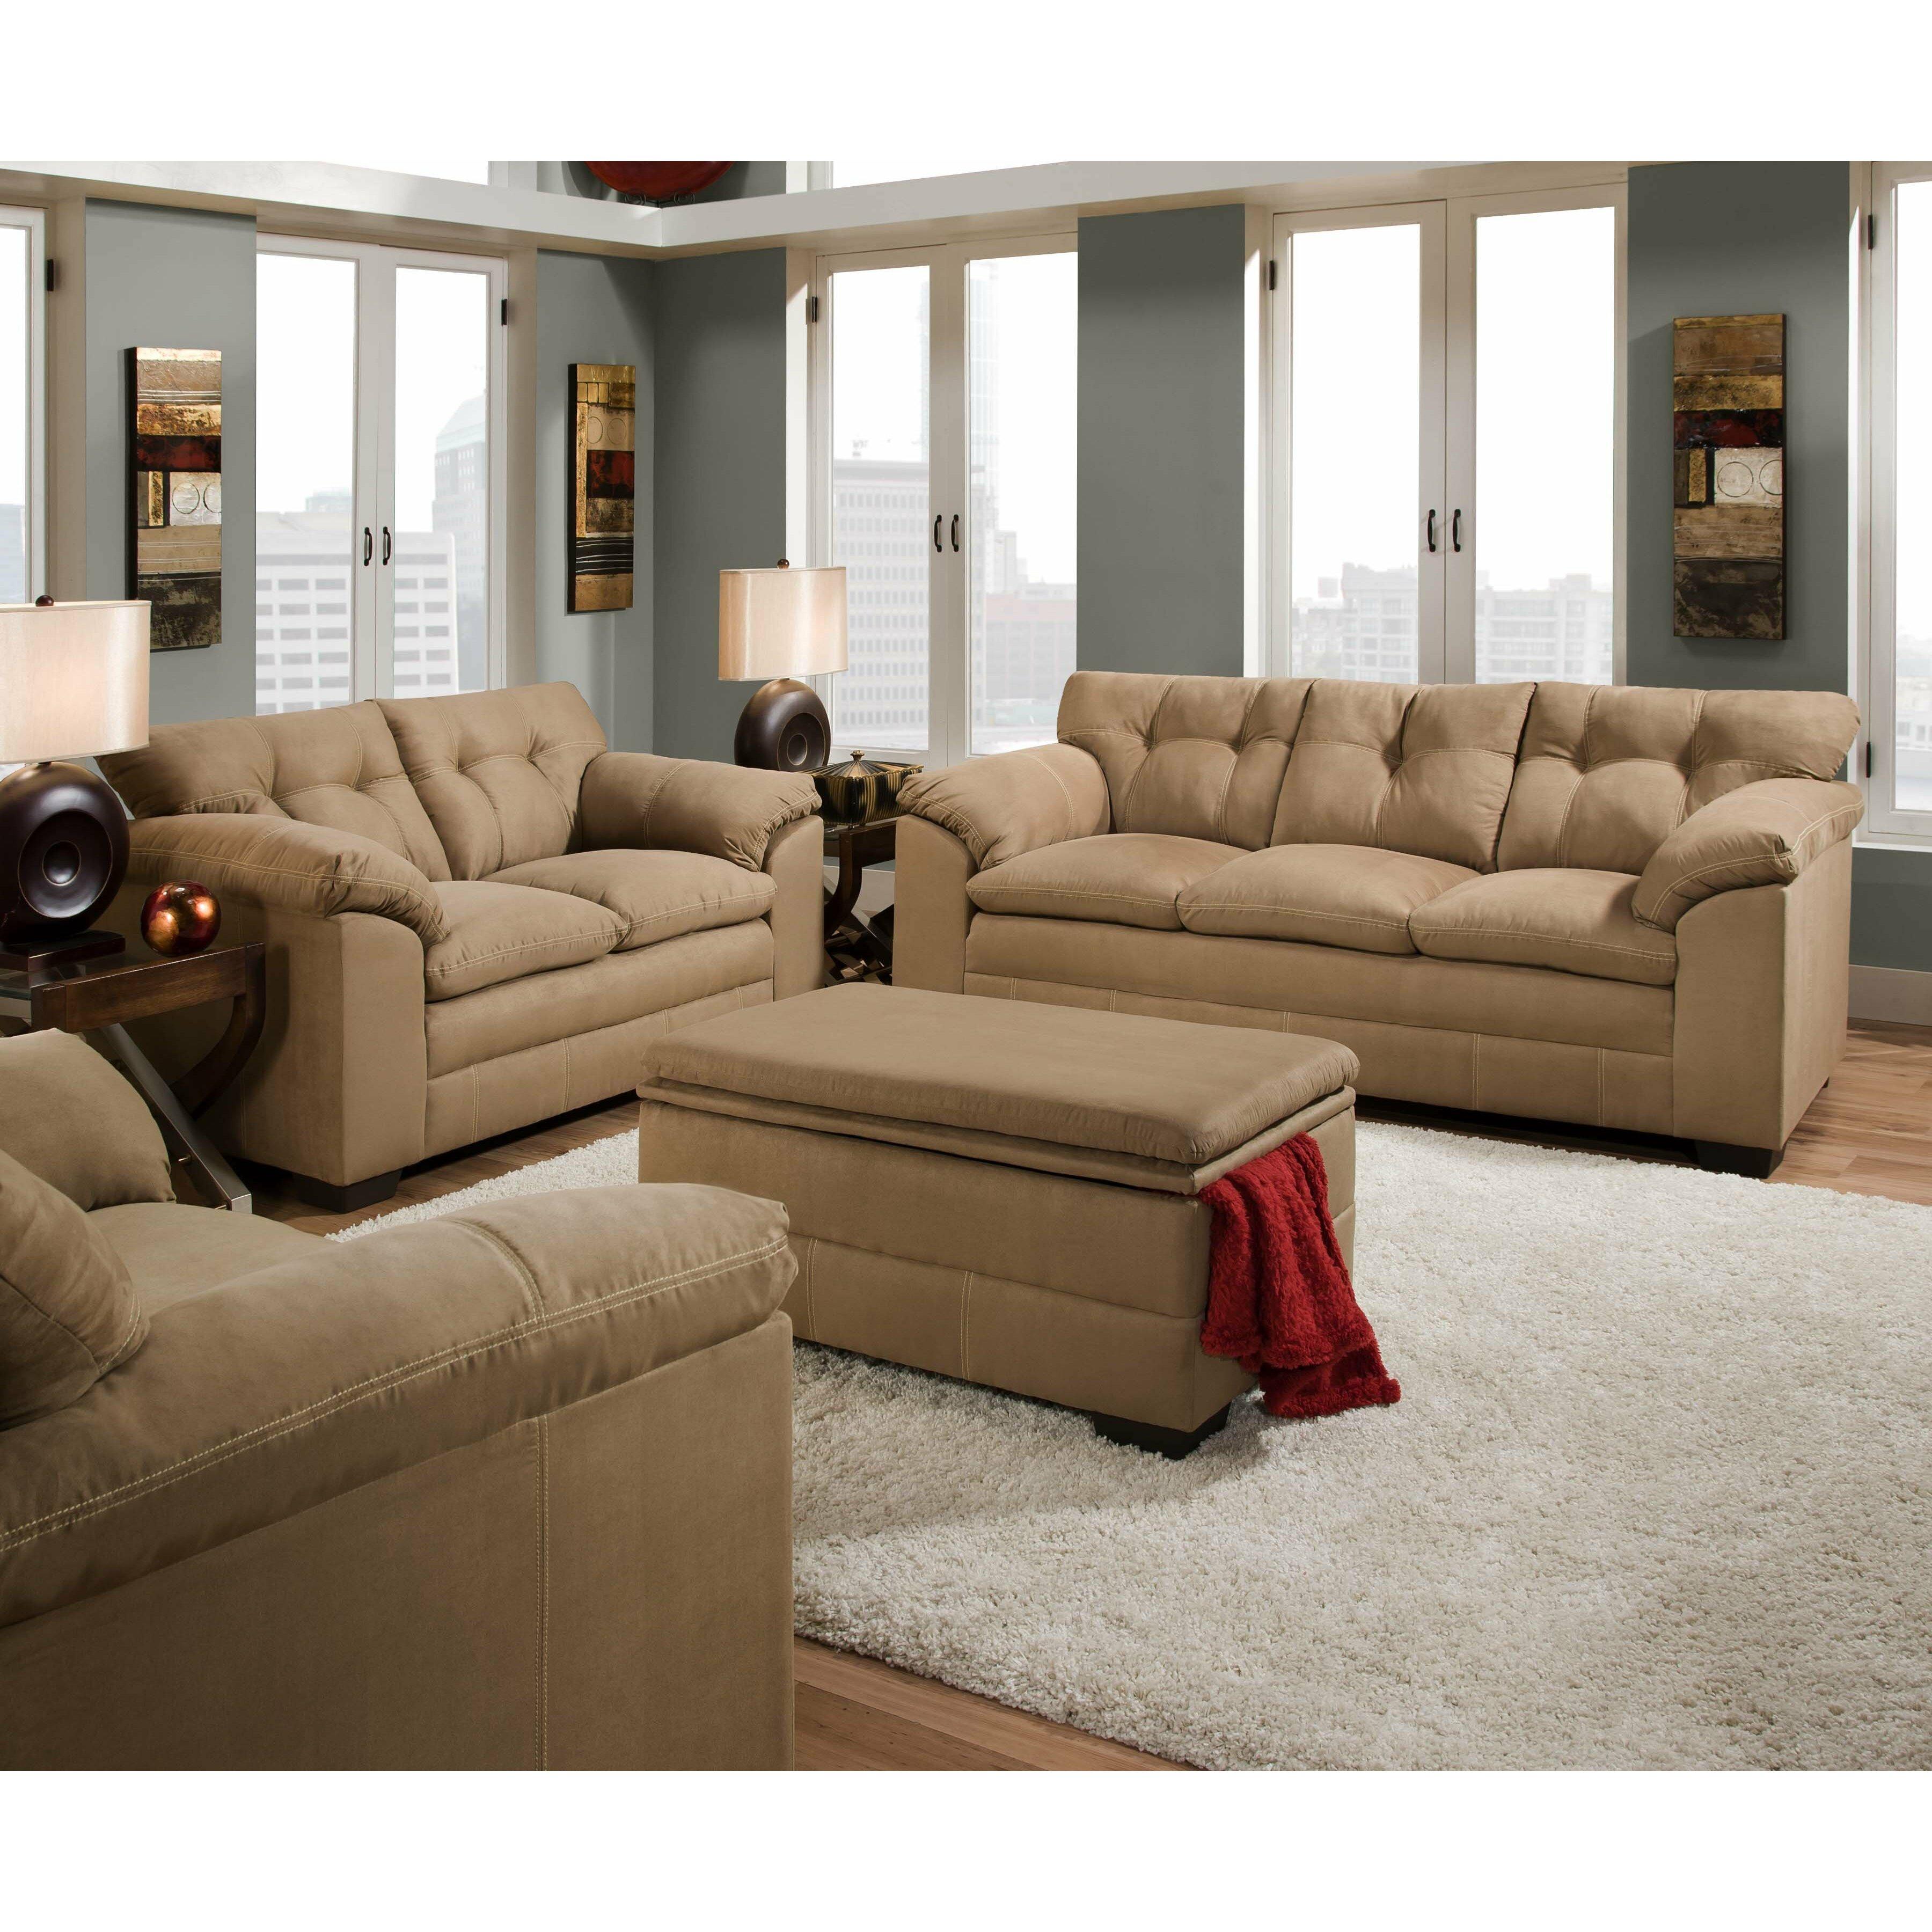 Wayfair Living Room Furniture Simmons Upholstery Velocity Living Room Collection Reviews Wayfair